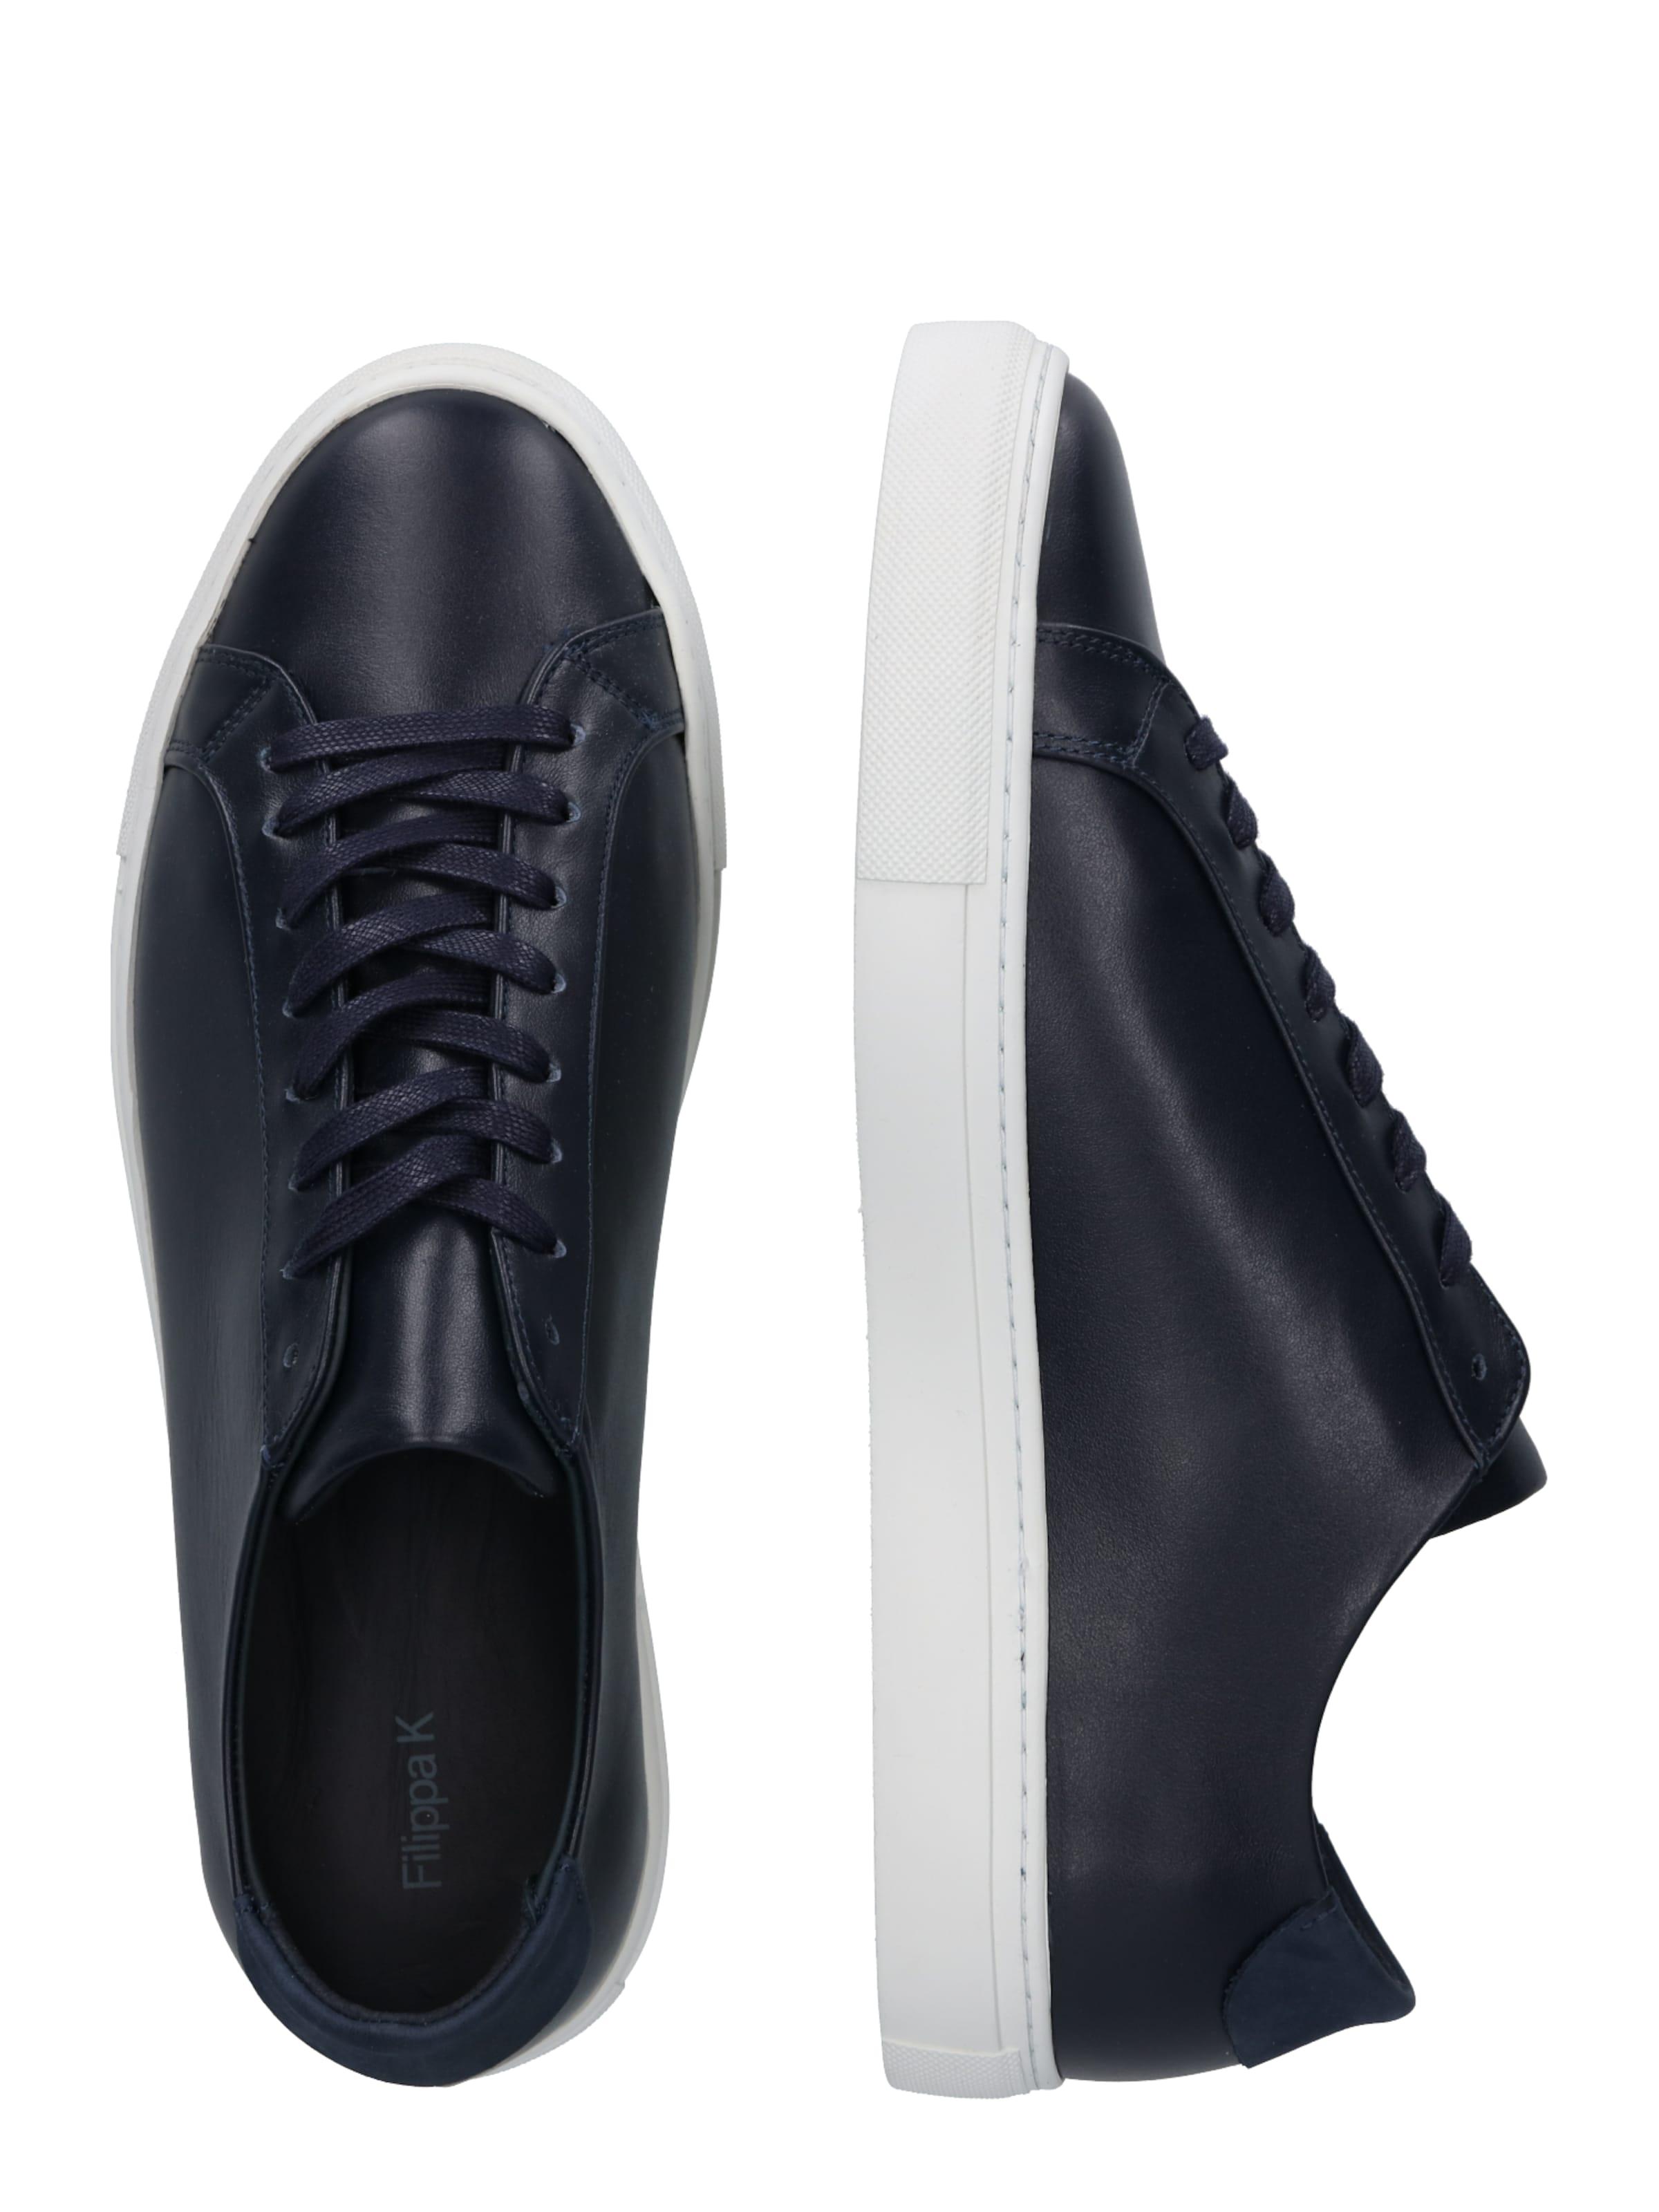 Sneaker In Kobaltblau 'mMorgan' Filippa K kwONnPX80